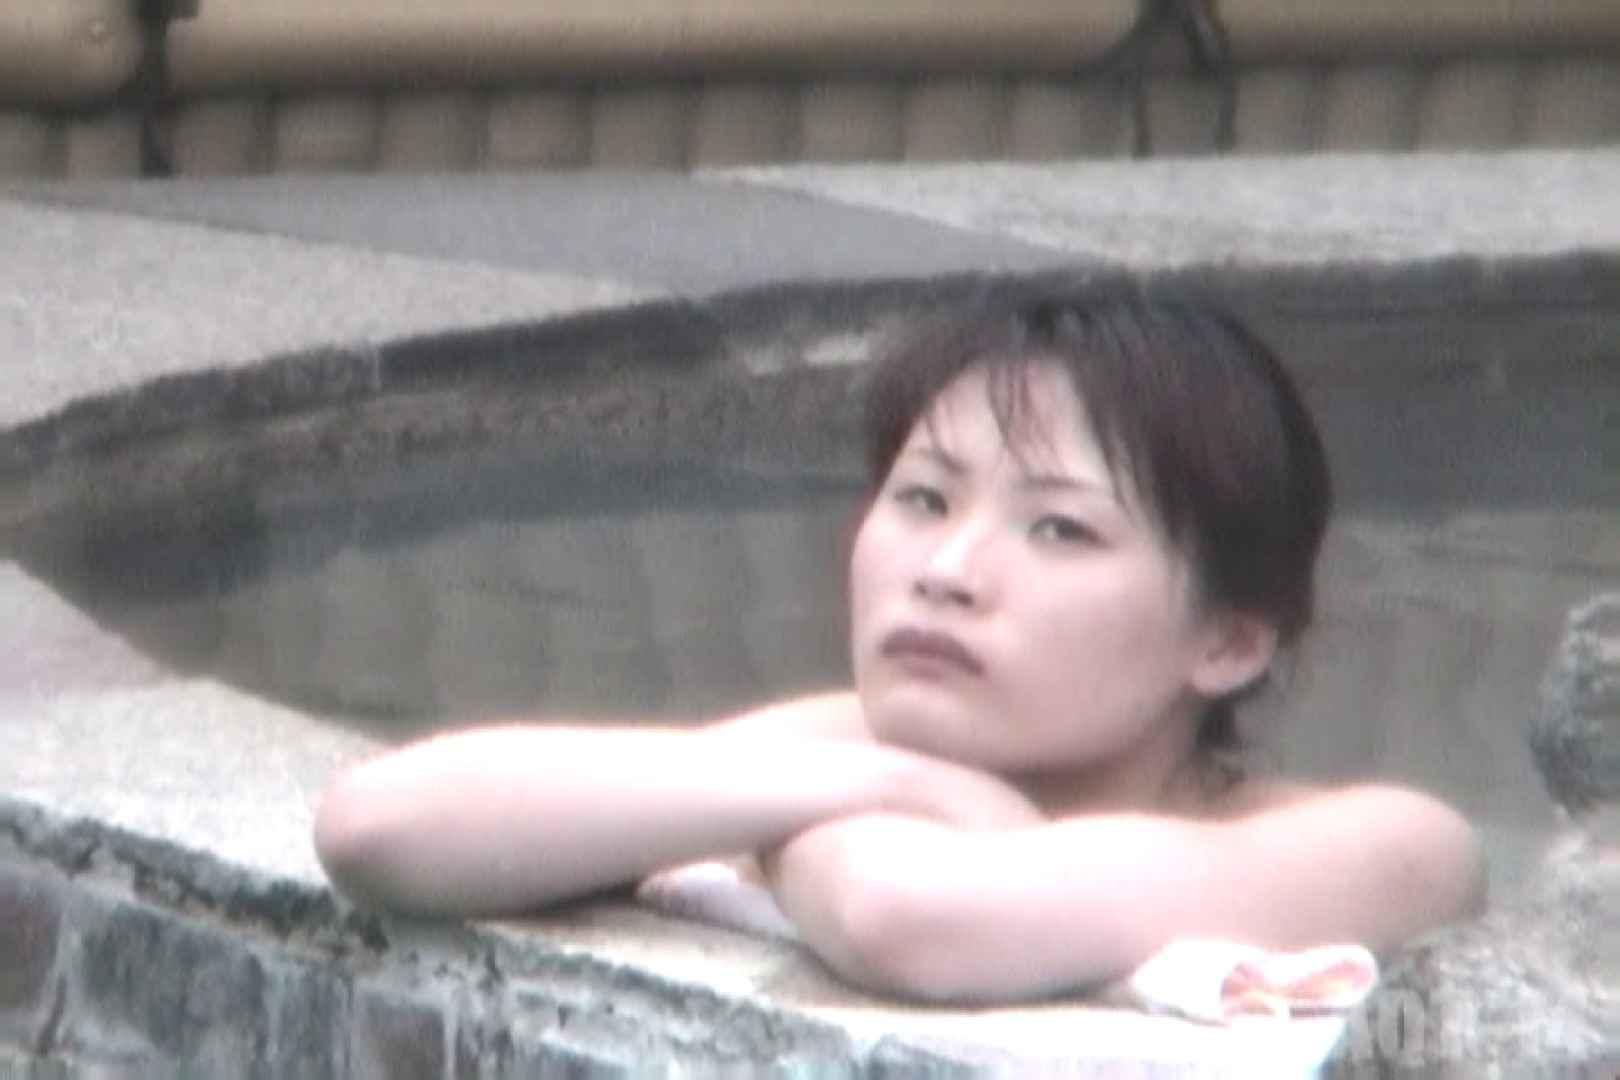 Aquaな露天風呂Vol.822 盗撮師作品 SEX無修正画像 75pic 26